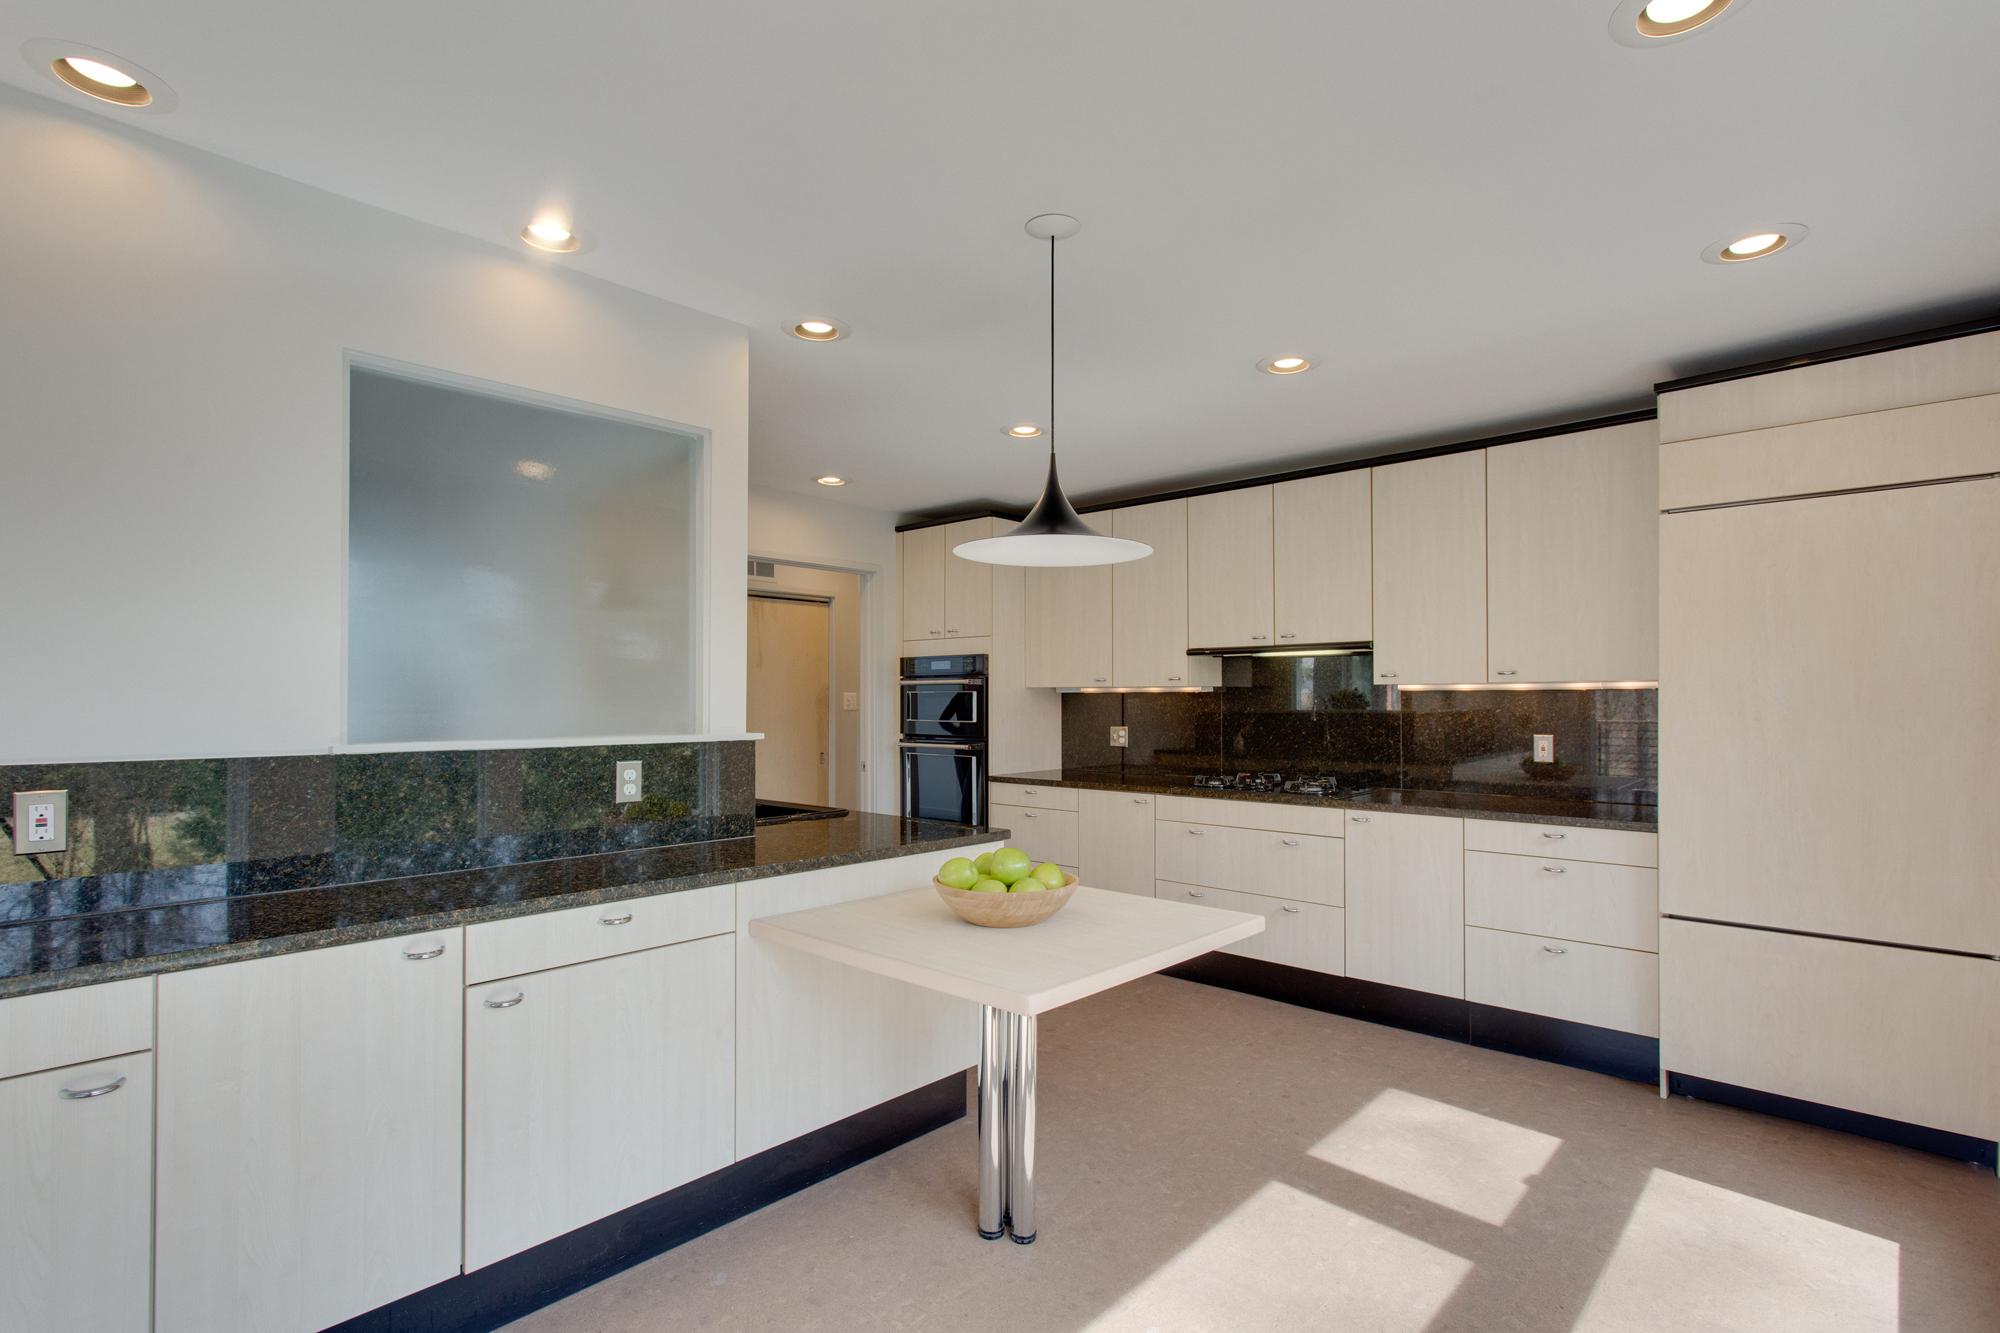 Kitchen Renovation In Falls Church, VA